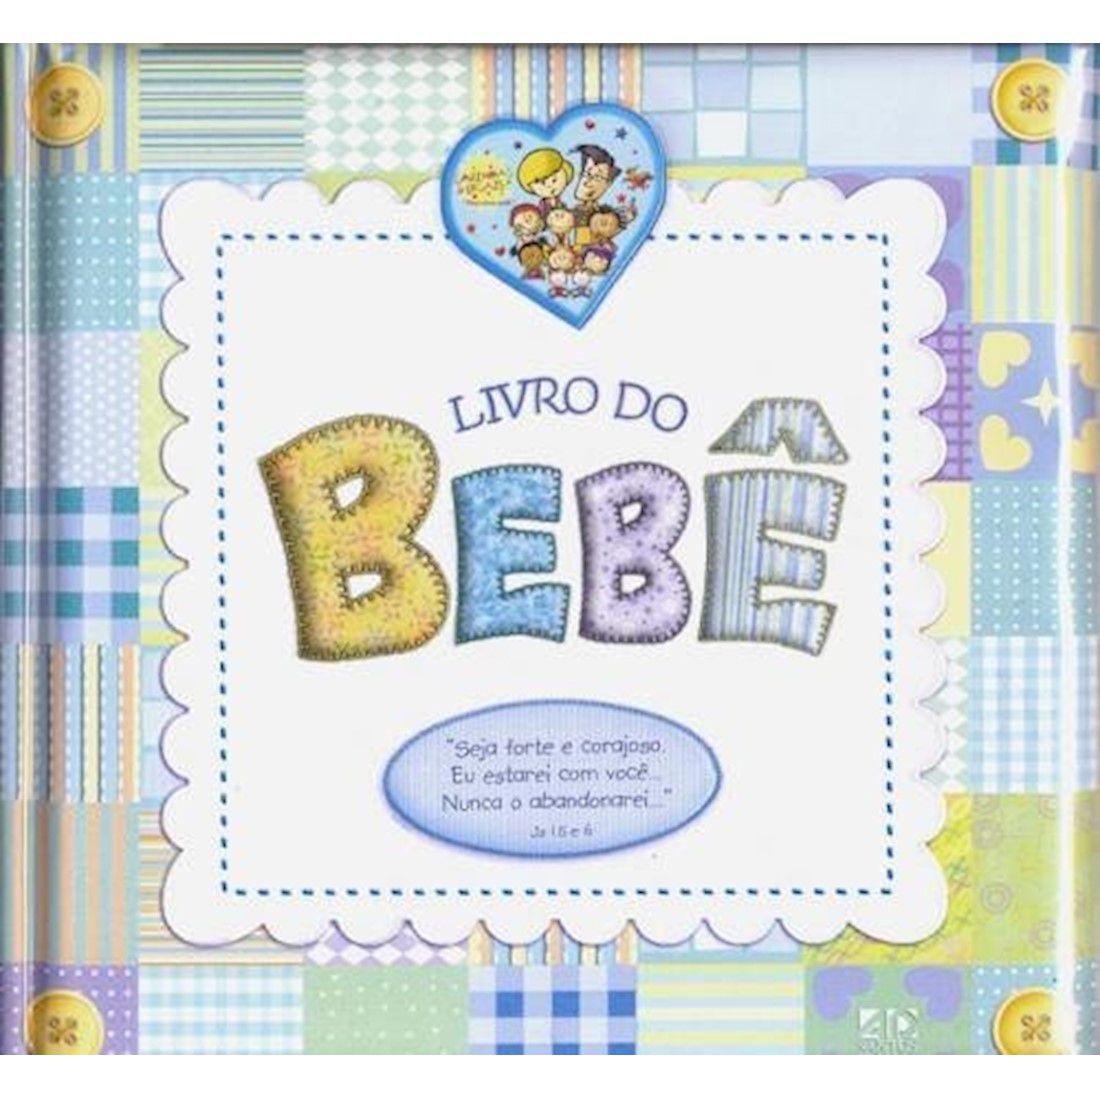 Livro do Bebê - Menino / Luxo